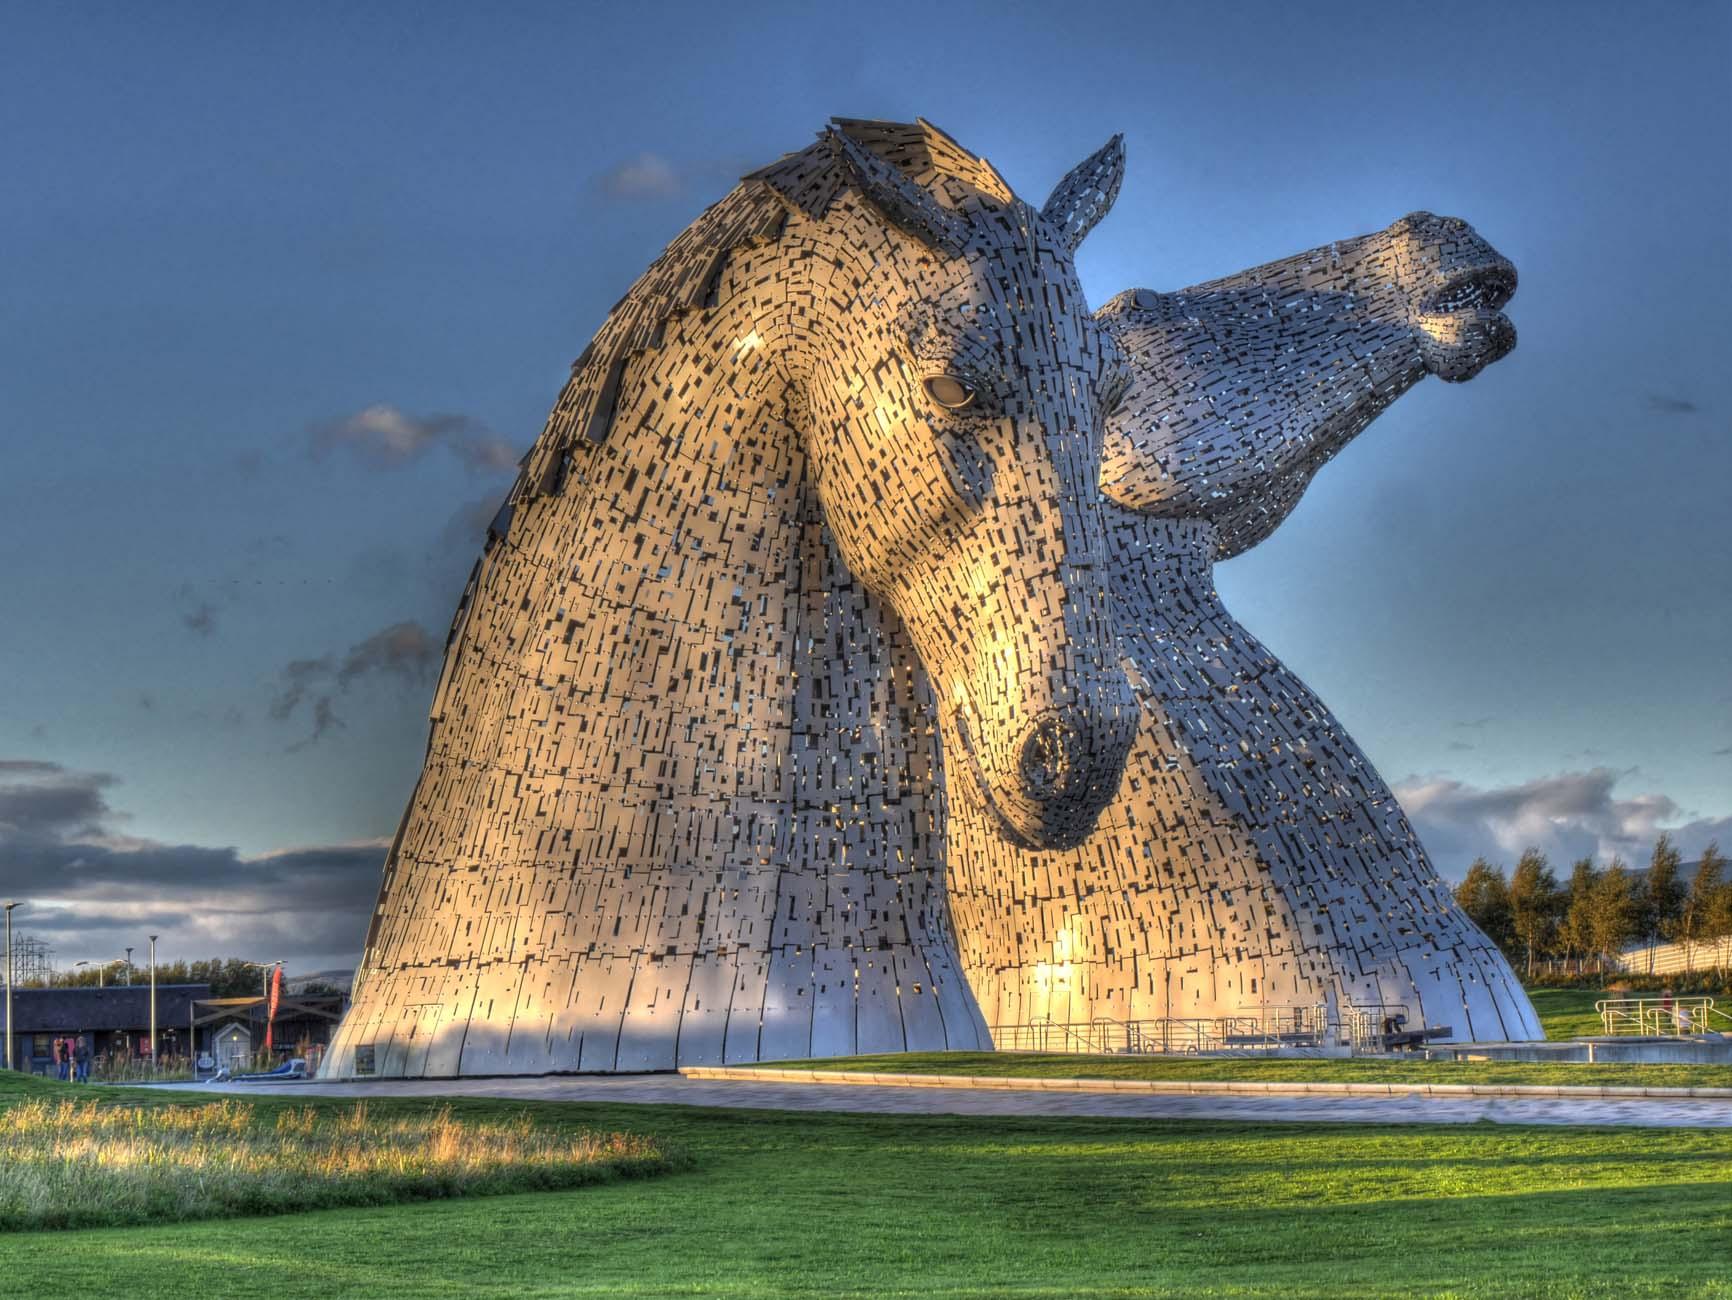 the Kelpies jigsaw puzzles , , Helix park, Falkirk HDR